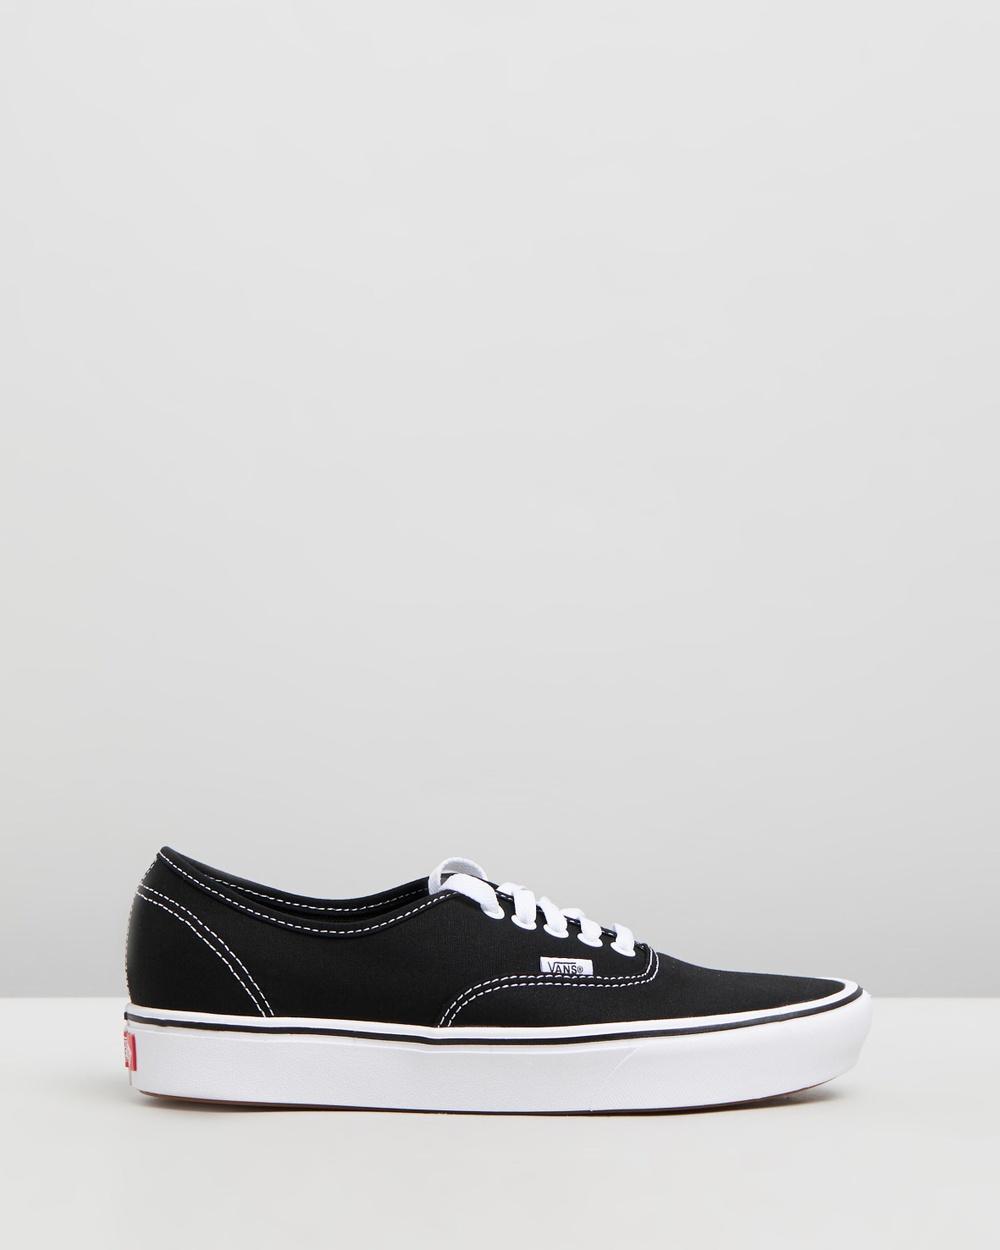 Vans ComfyCush Authentic Unisex Sneakers Black & True White Australia